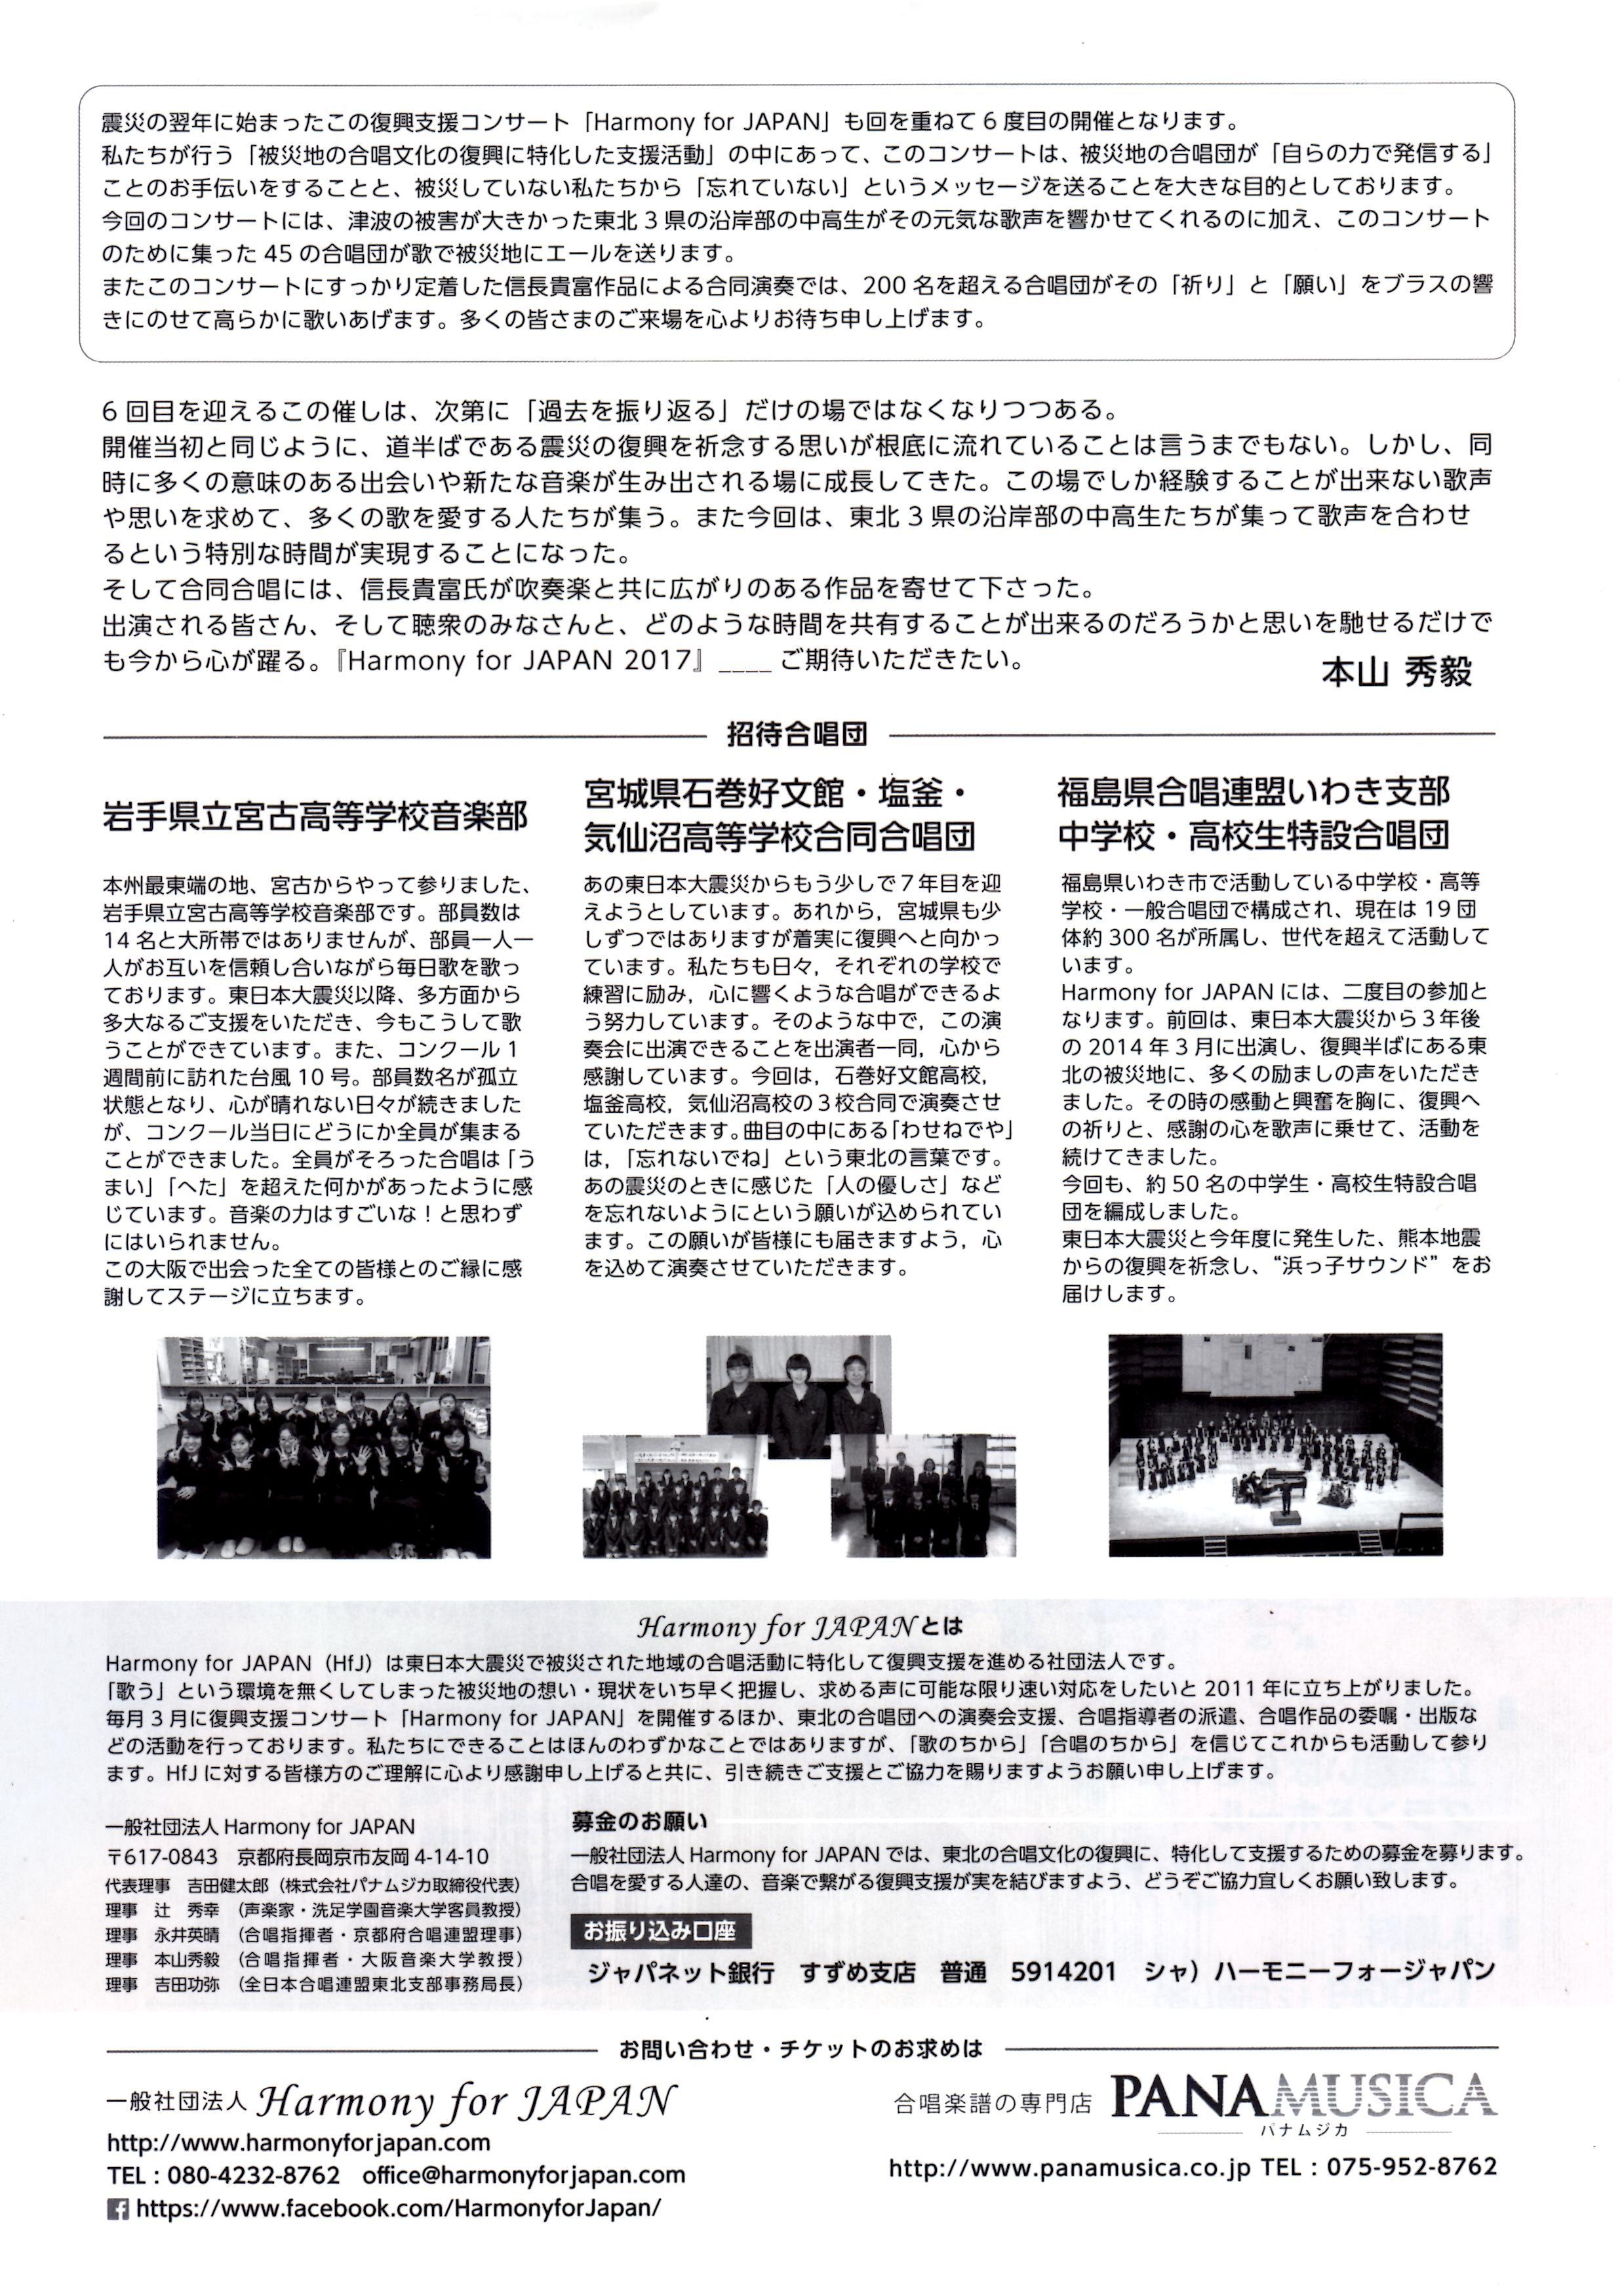 harmony for japan 2017裏